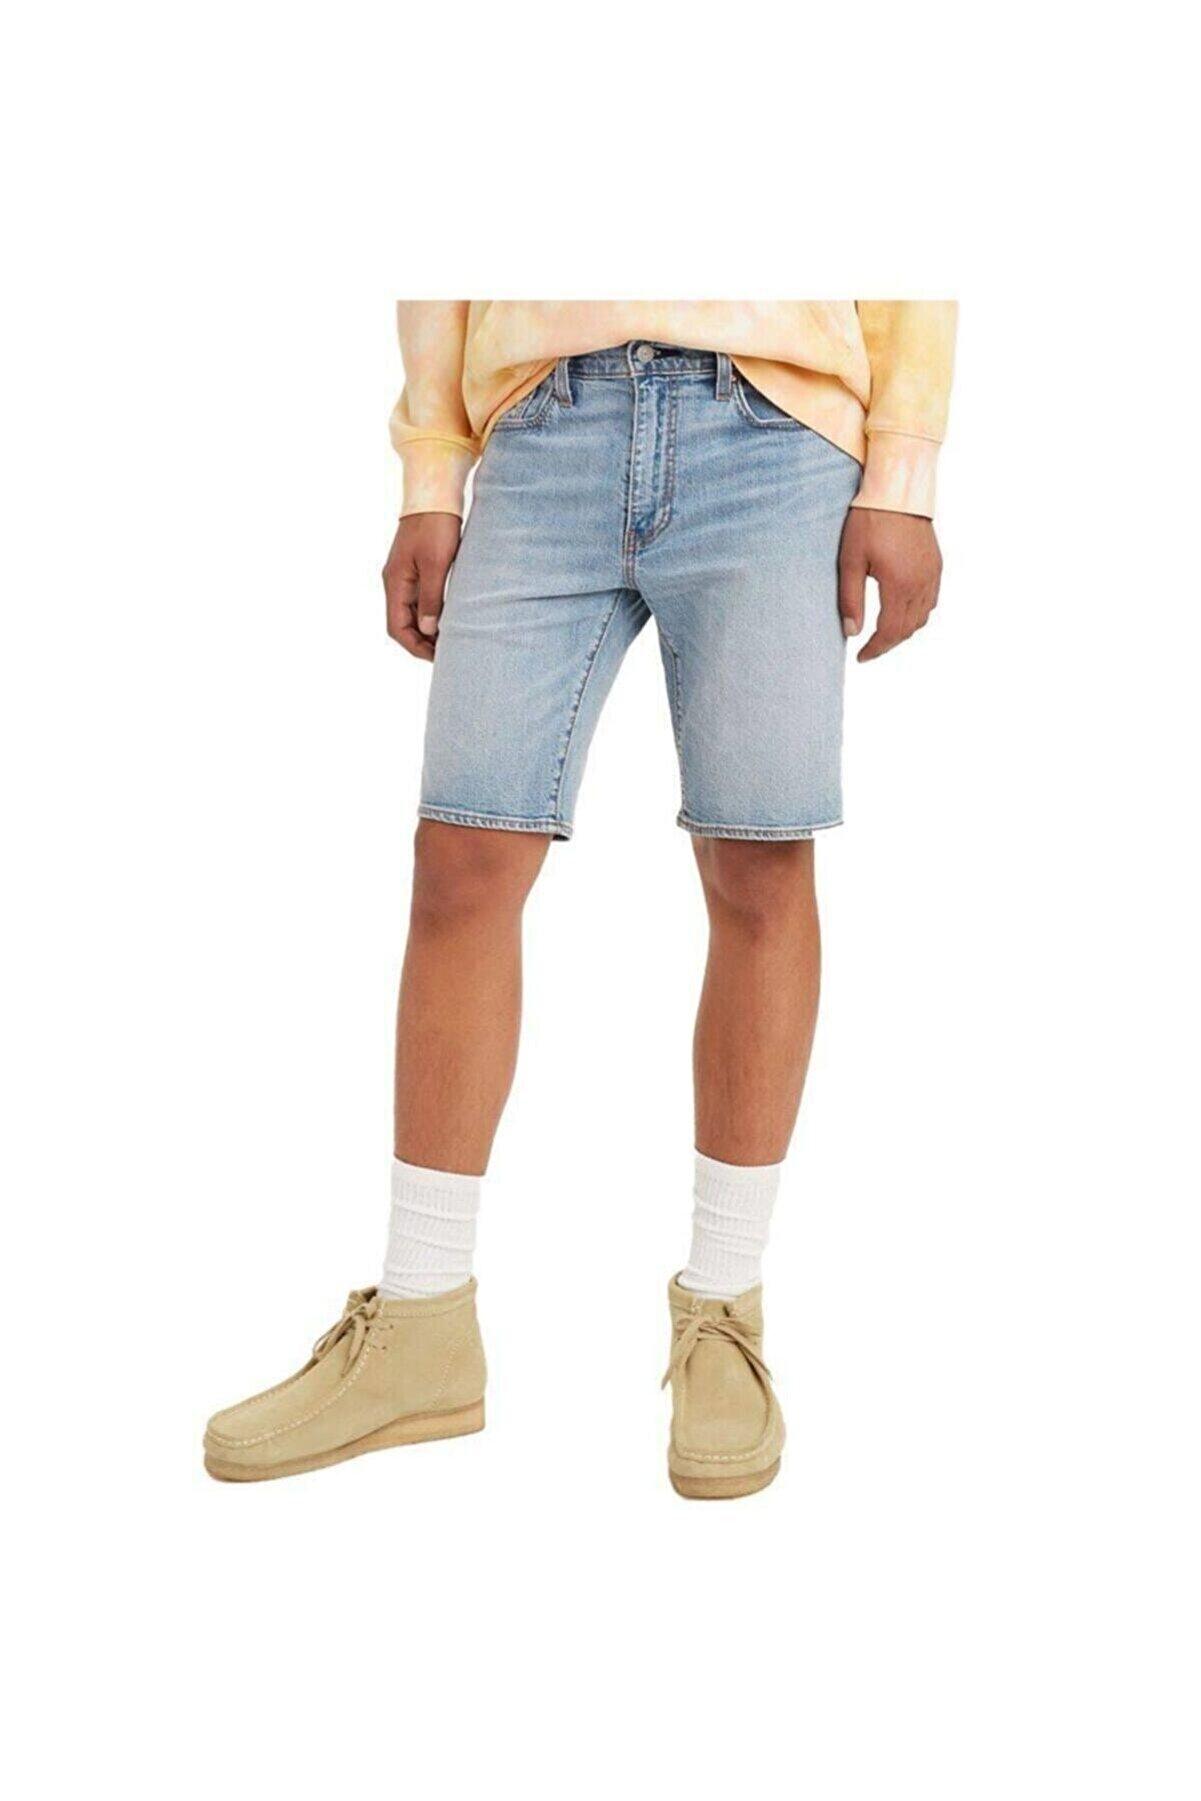 Levi's Standard Short